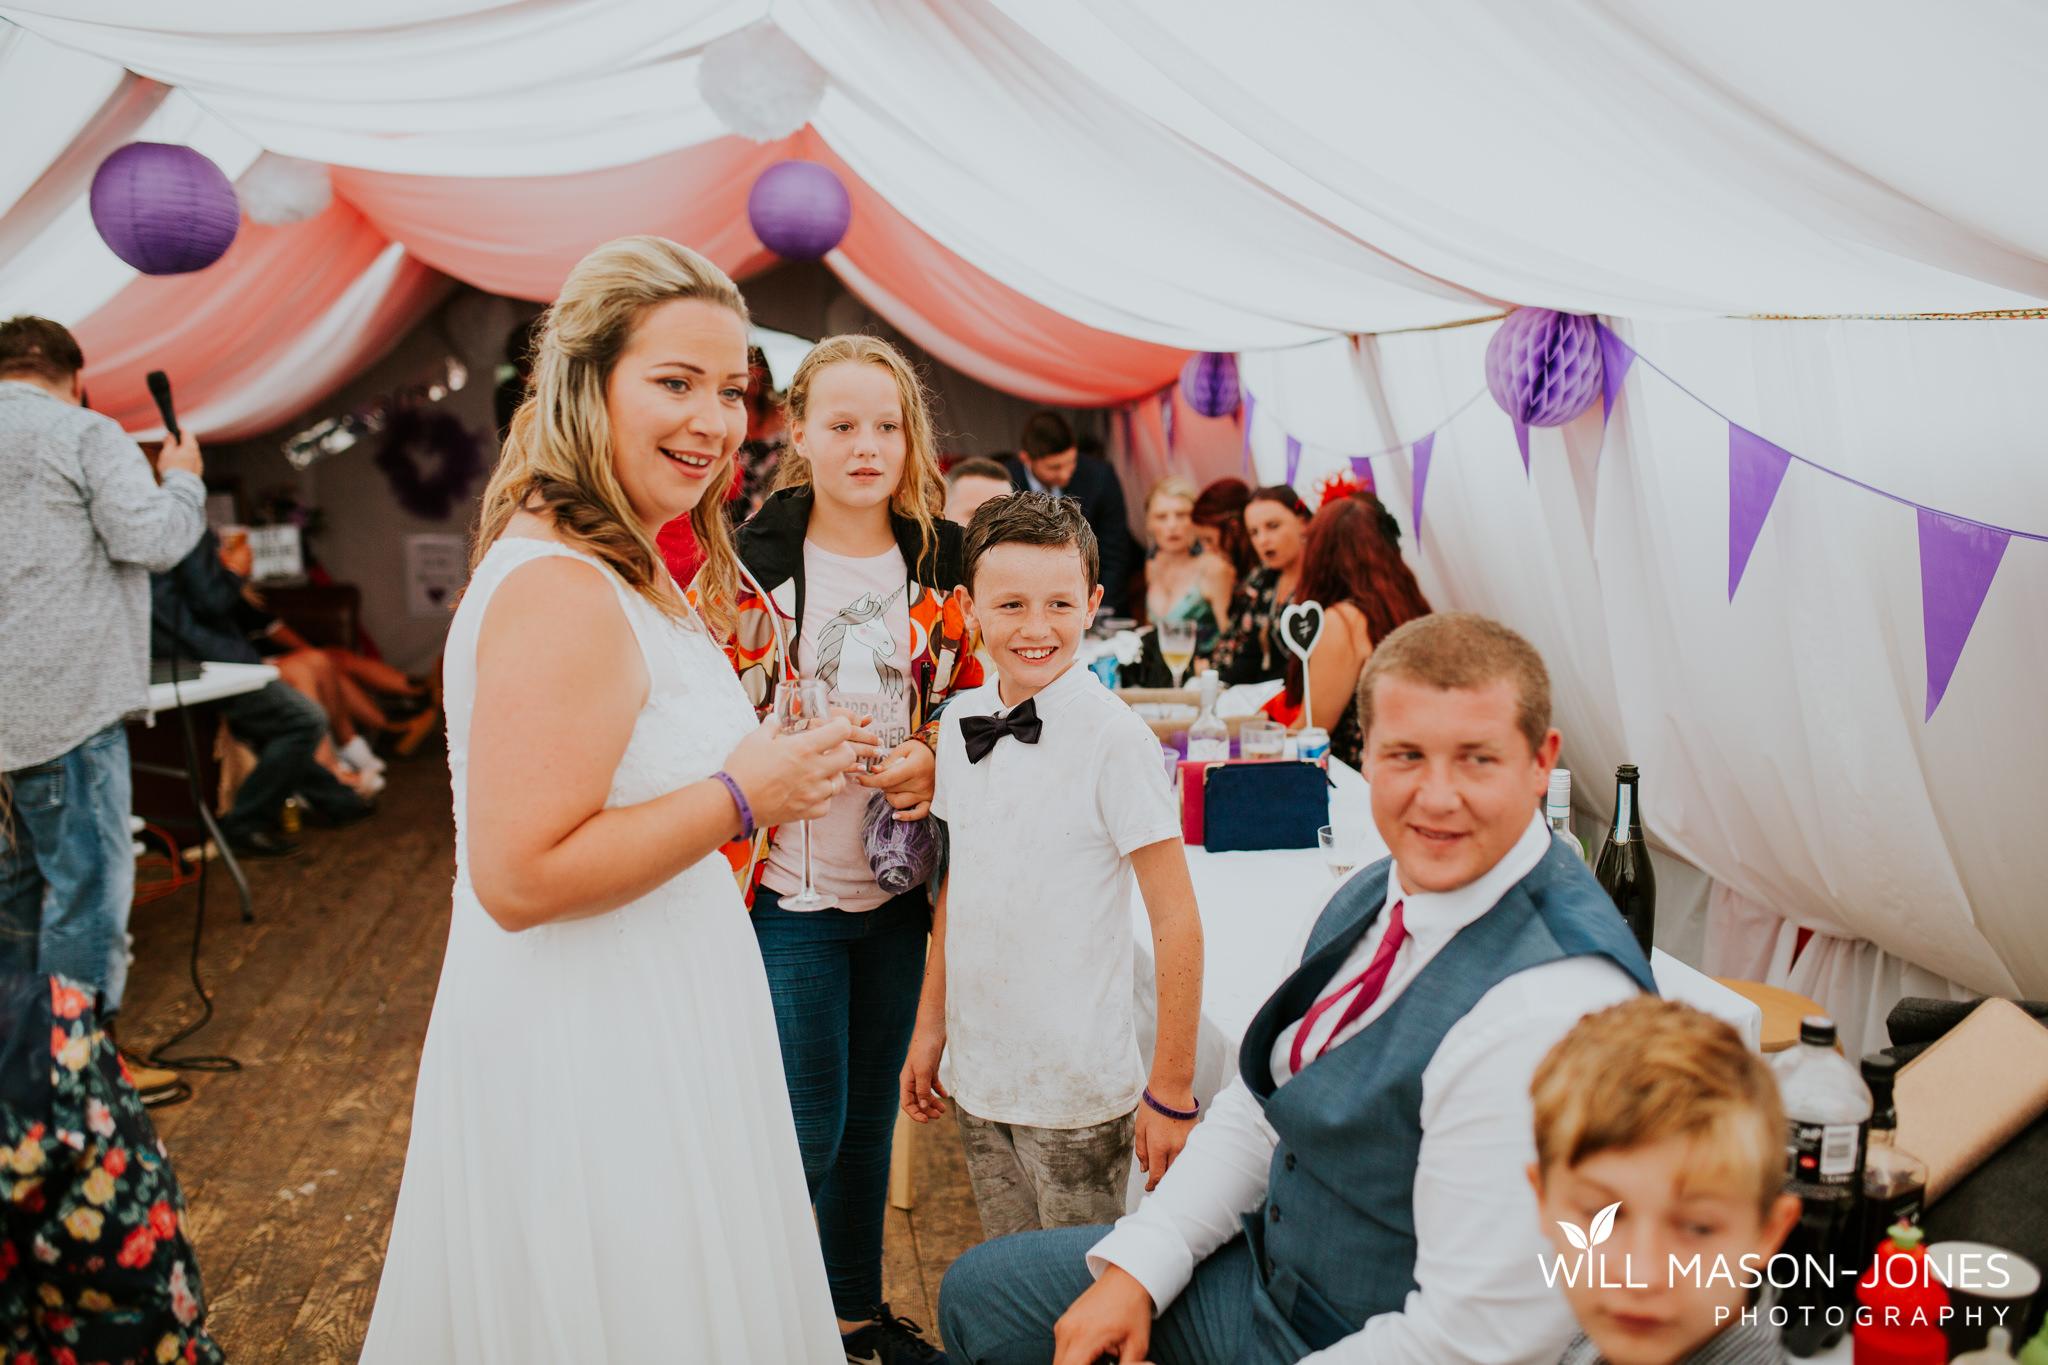 outdoor-wet-rainy-wedding-uk-swansea-photography-11.jpg